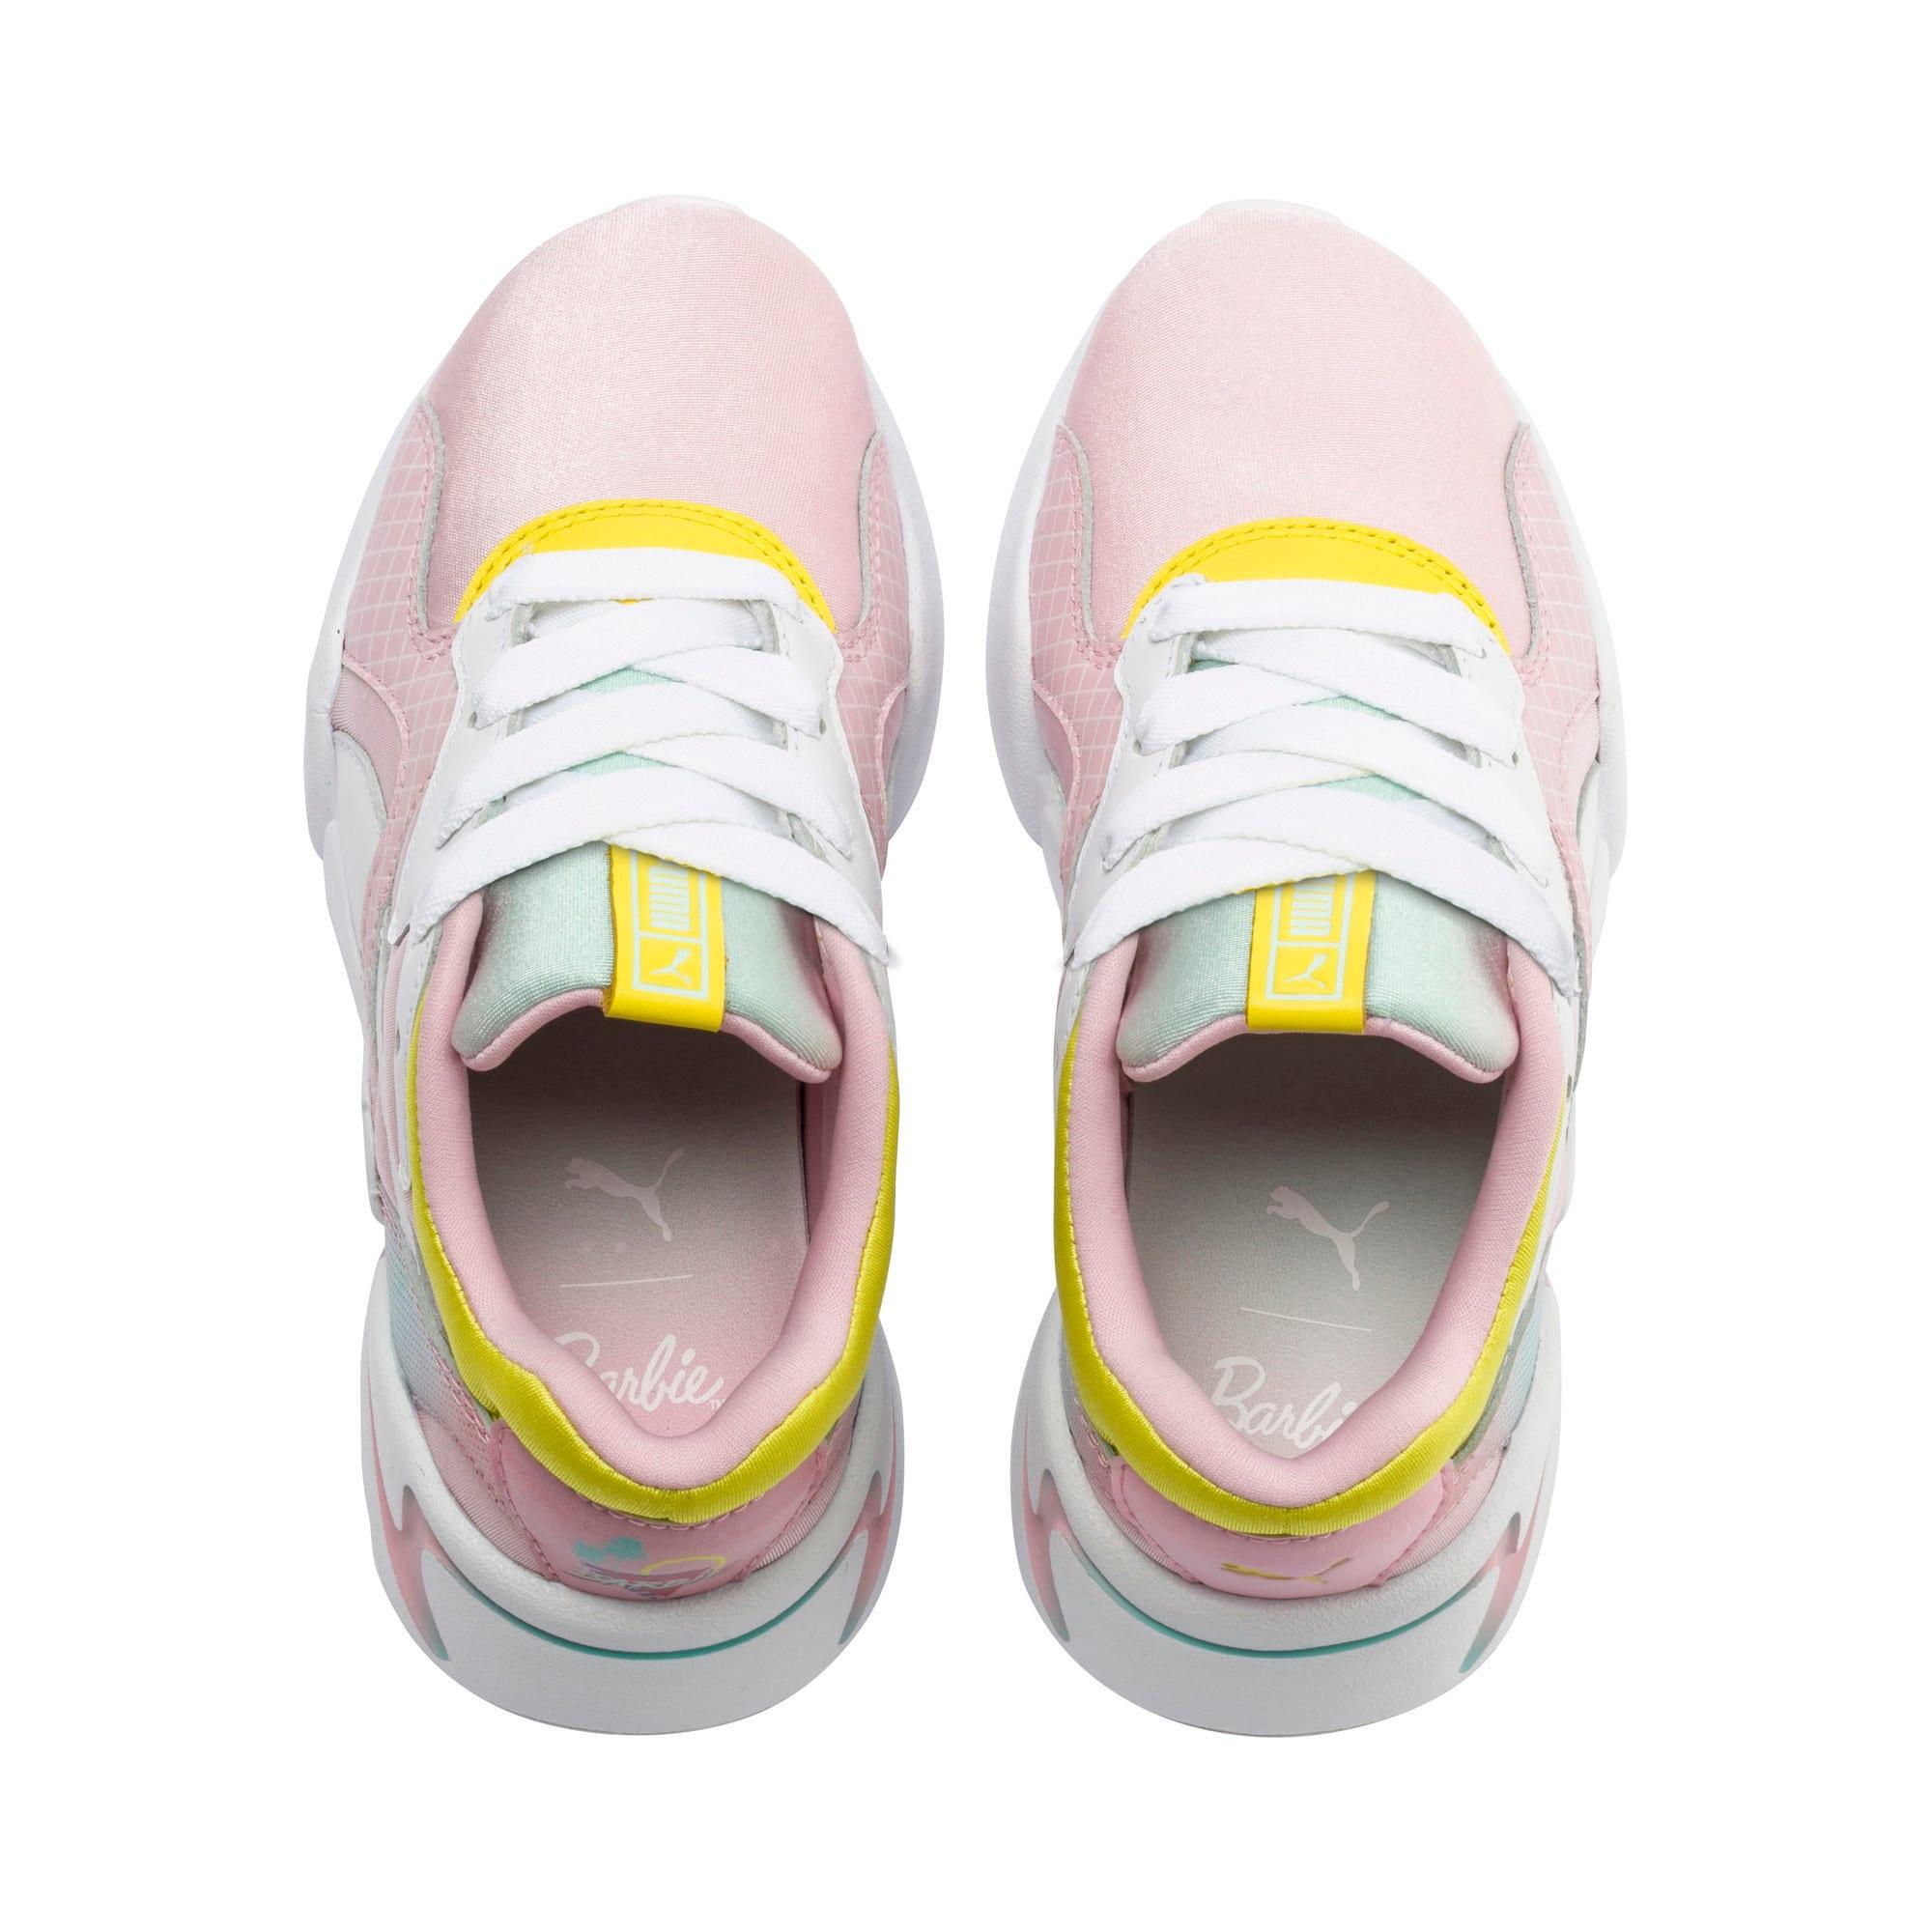 Thumbnail 6 of Nova x Barbie Little Kids' Shoes, Orchid Pink-Puma White, medium